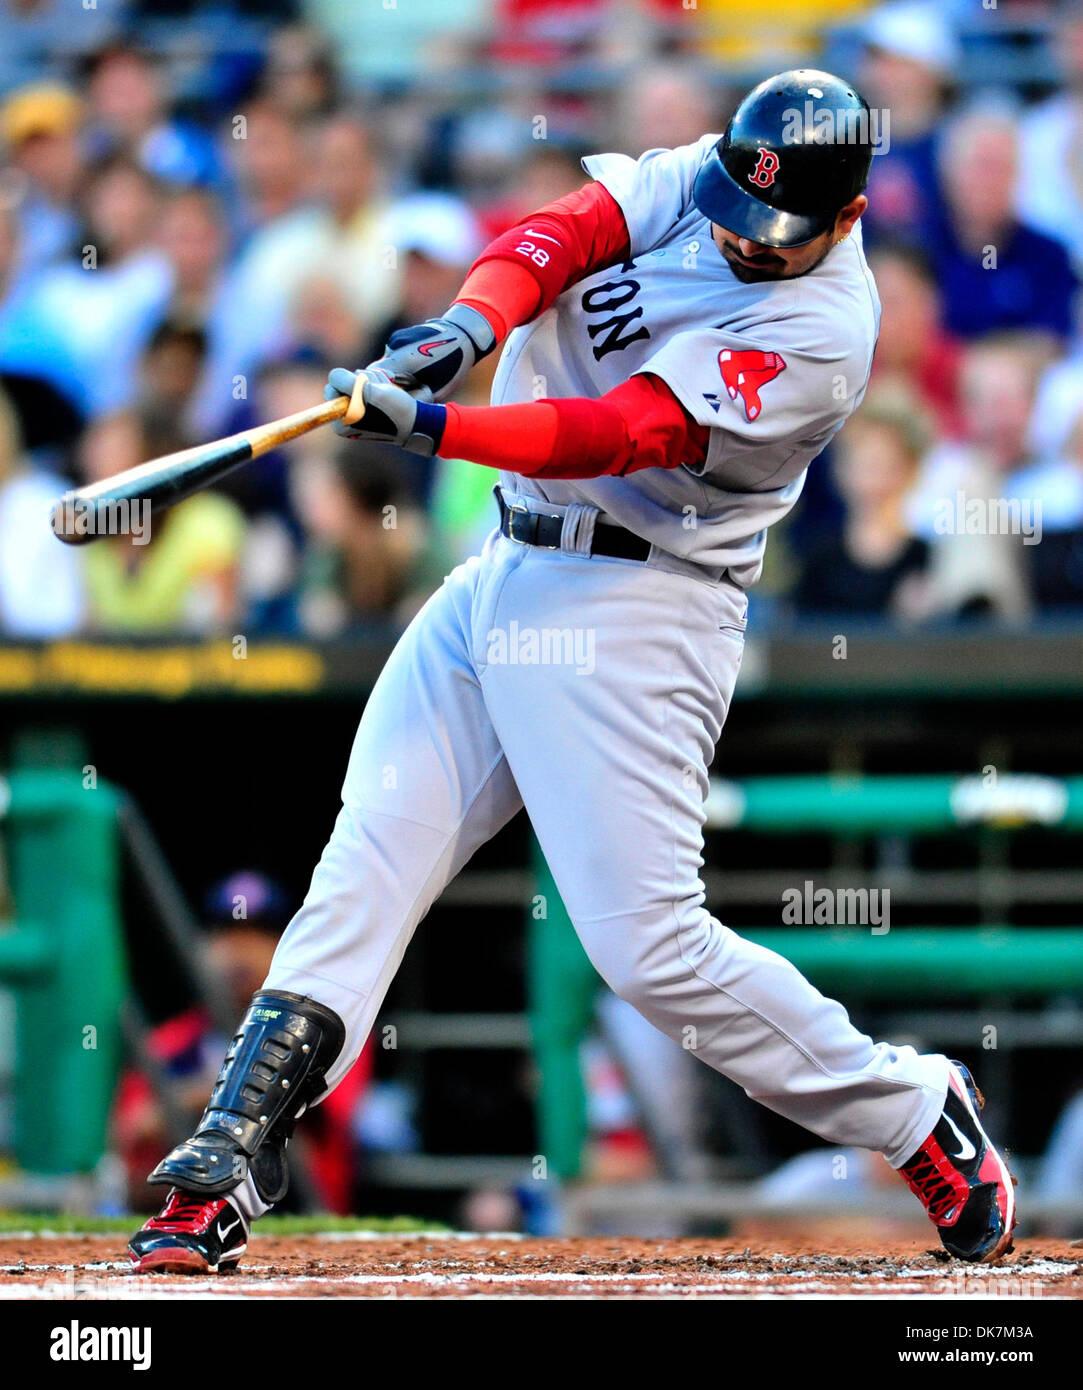 Famoso Colorear Boston Red Sox Ilustración - Dibujos Para Colorear ...